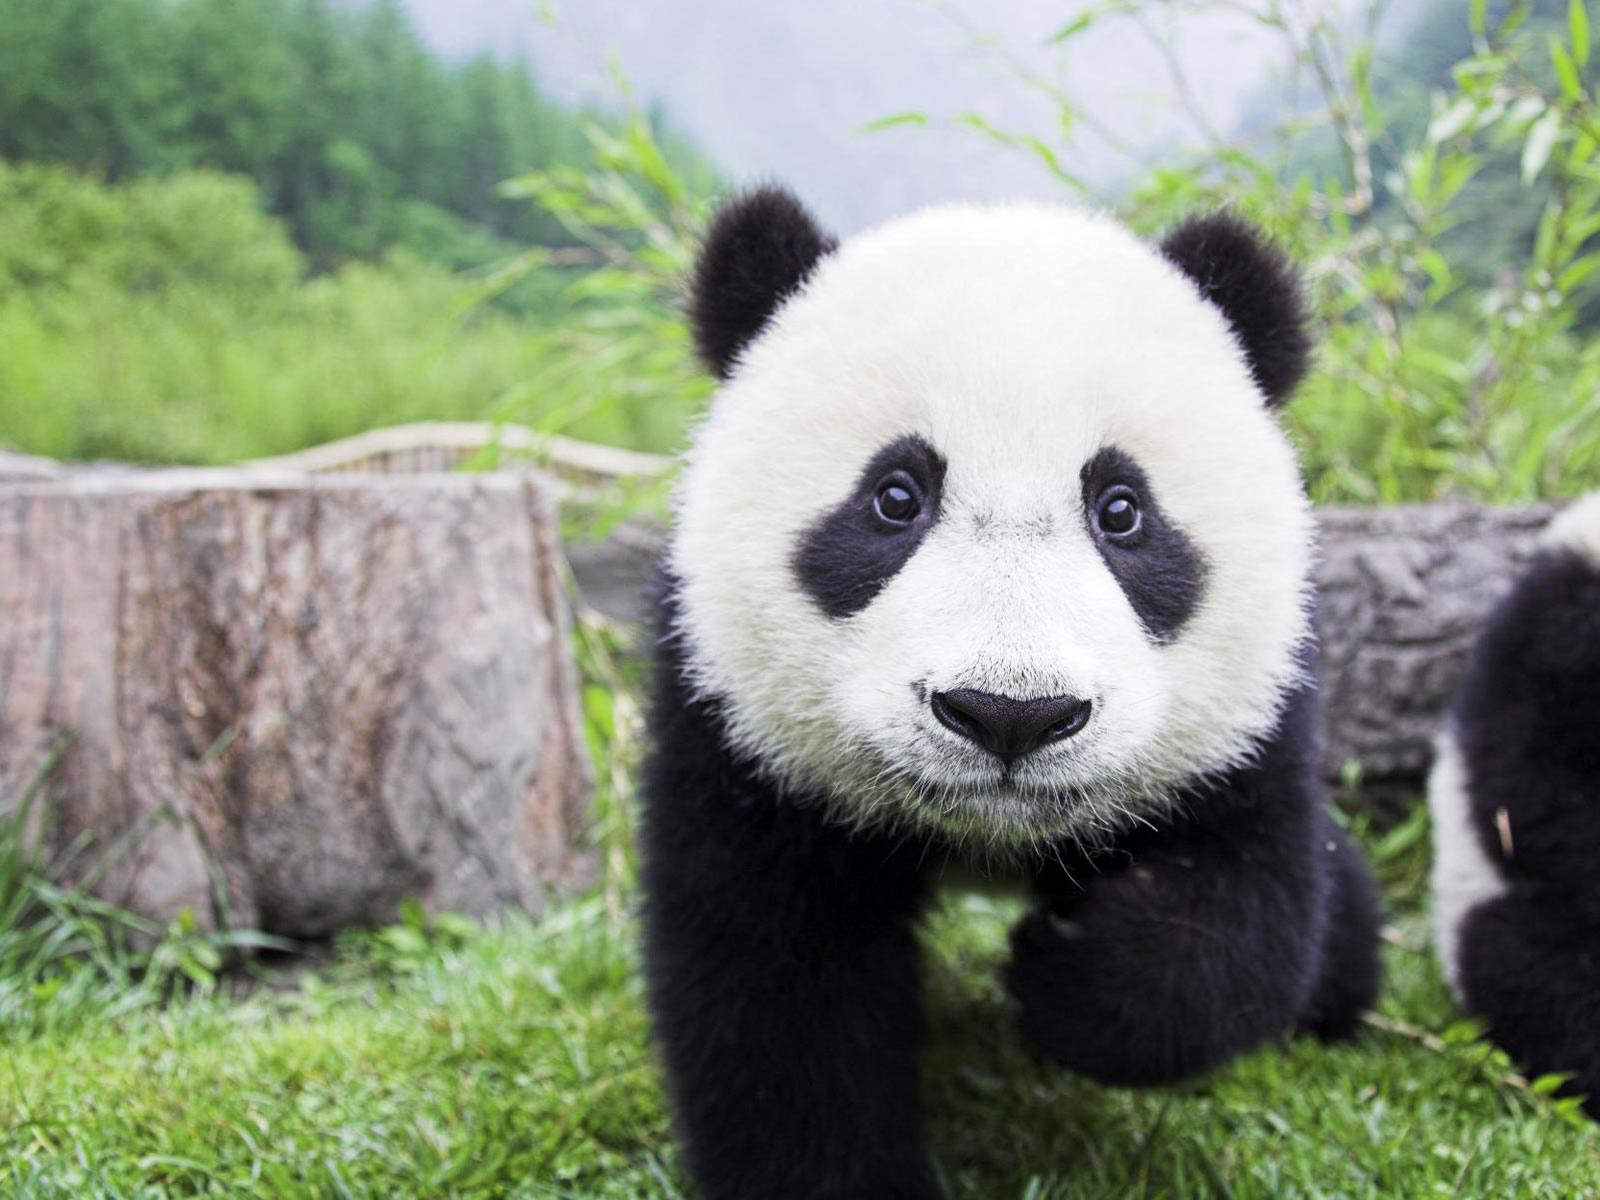 http://1.bp.blogspot.com/-3NfUPm_FBao/T_HkfxpH2lI/AAAAAAAAAB8/j2ayXhiiv70/s1600/baby_panda_wallpaper.jpg